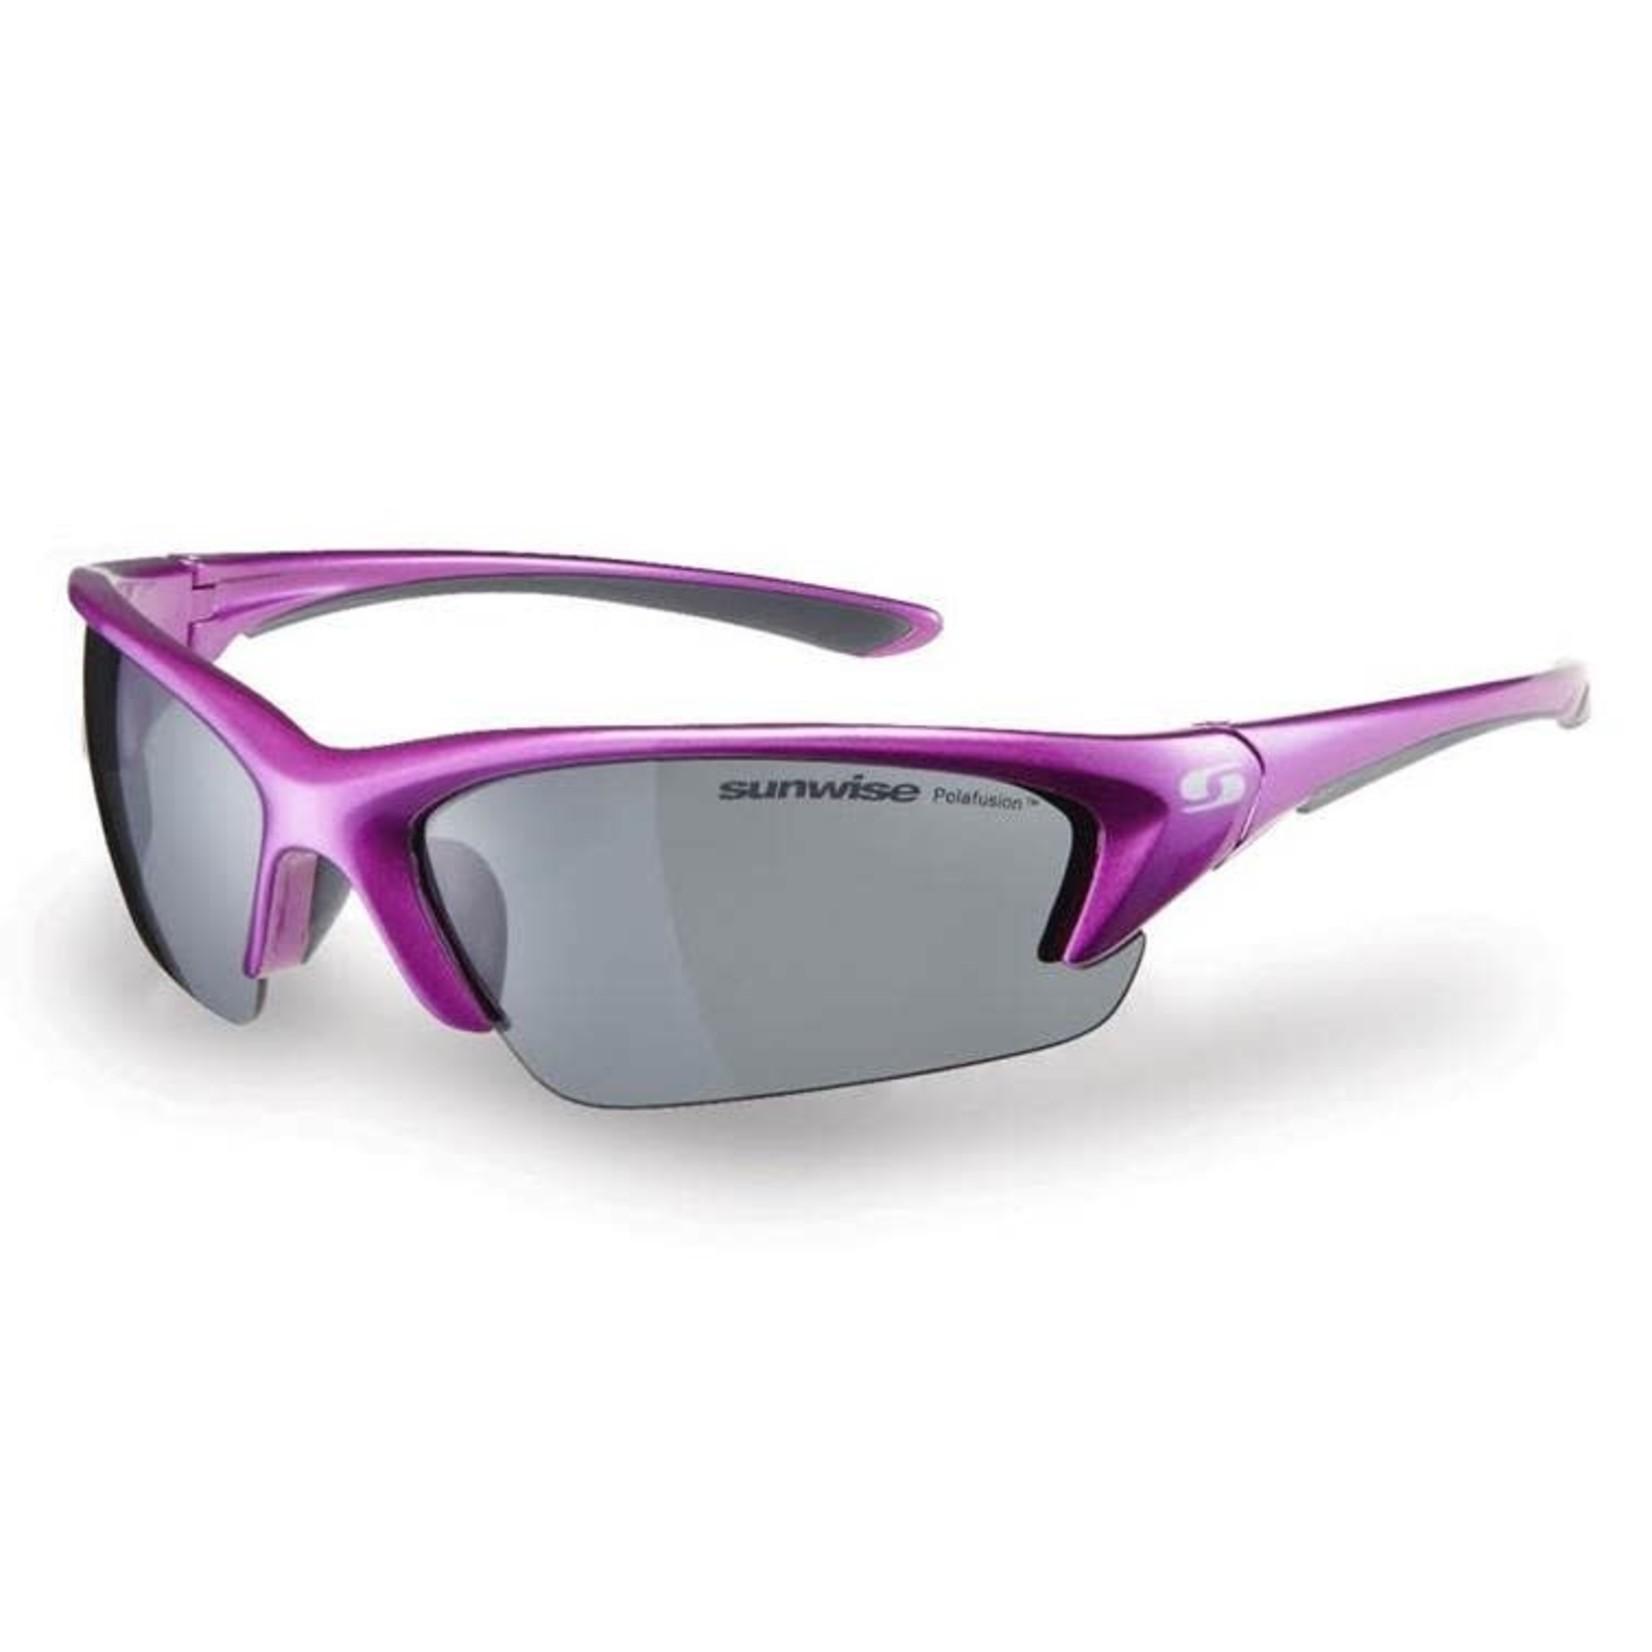 Sunwise Canary Wharf Sunglasses Purple